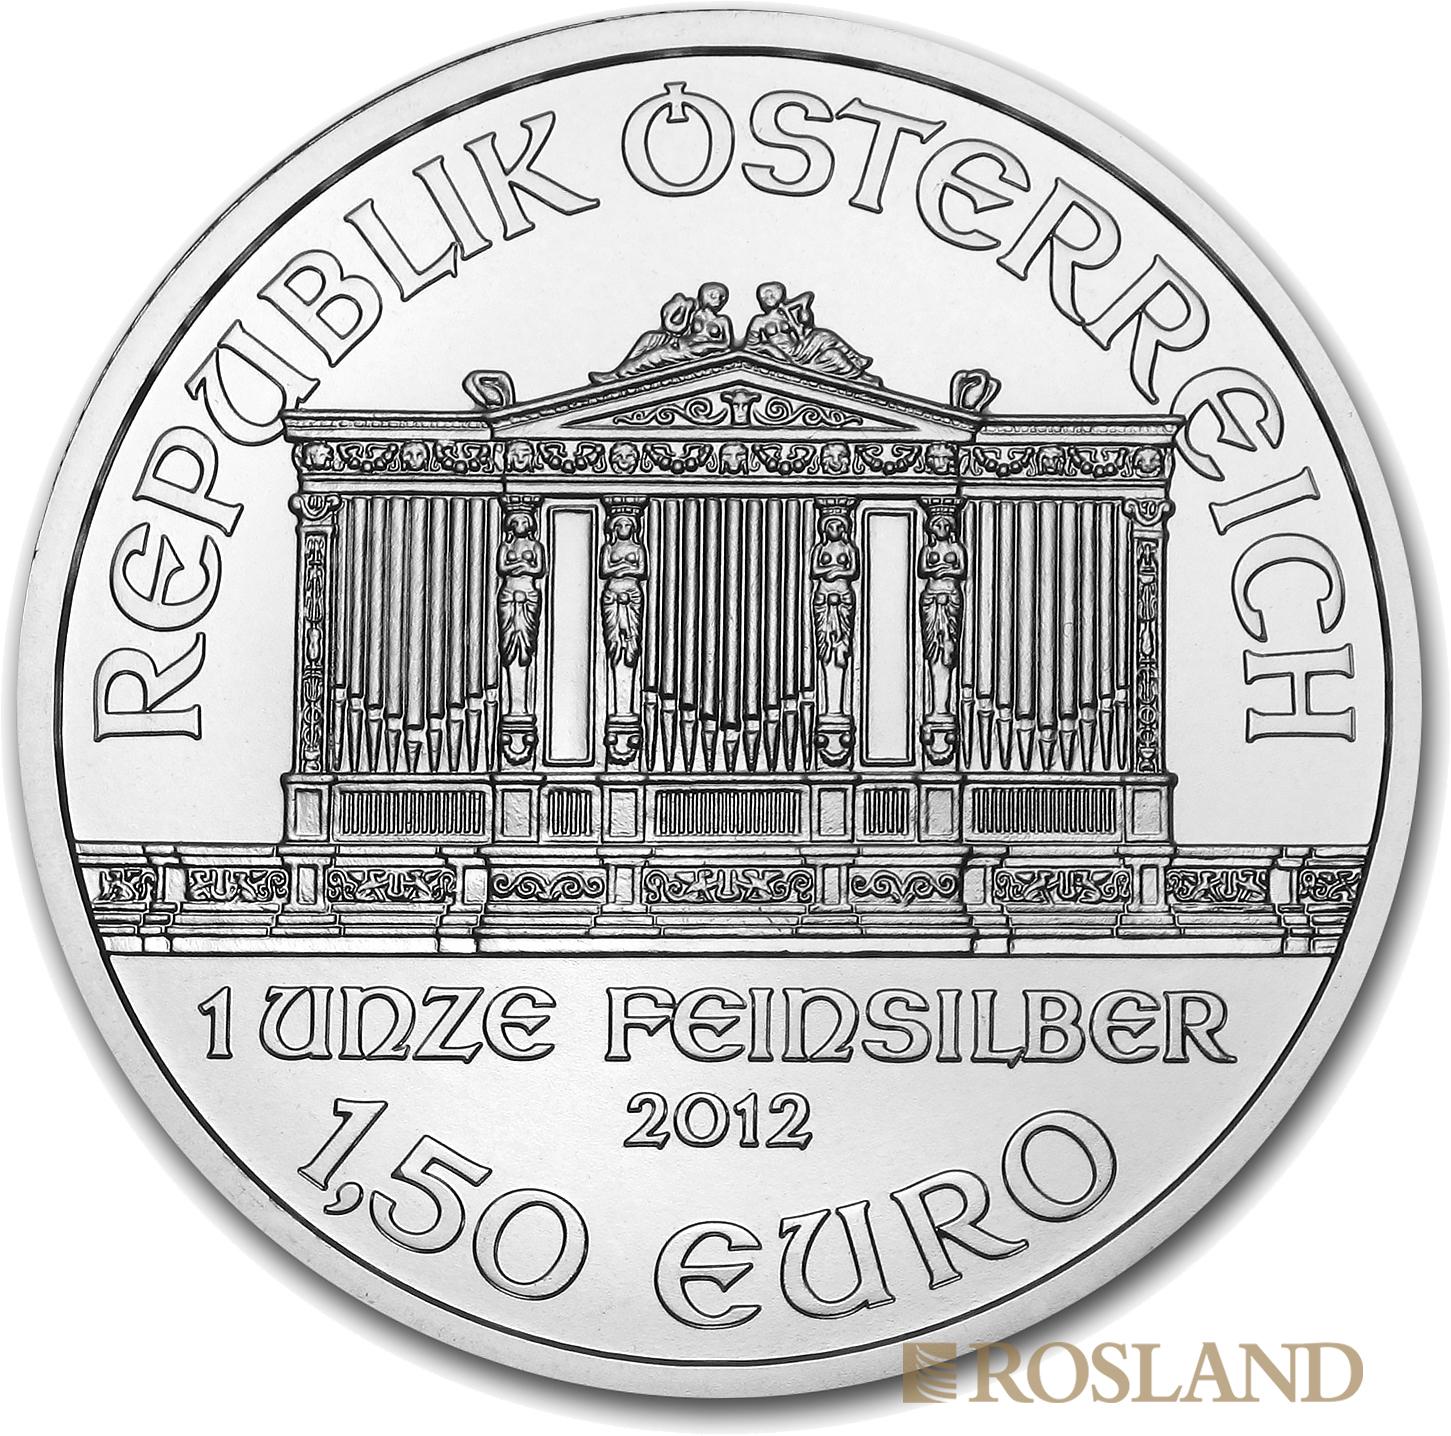 1 Unze Silbermünze Wiener Philharmoniker 2012